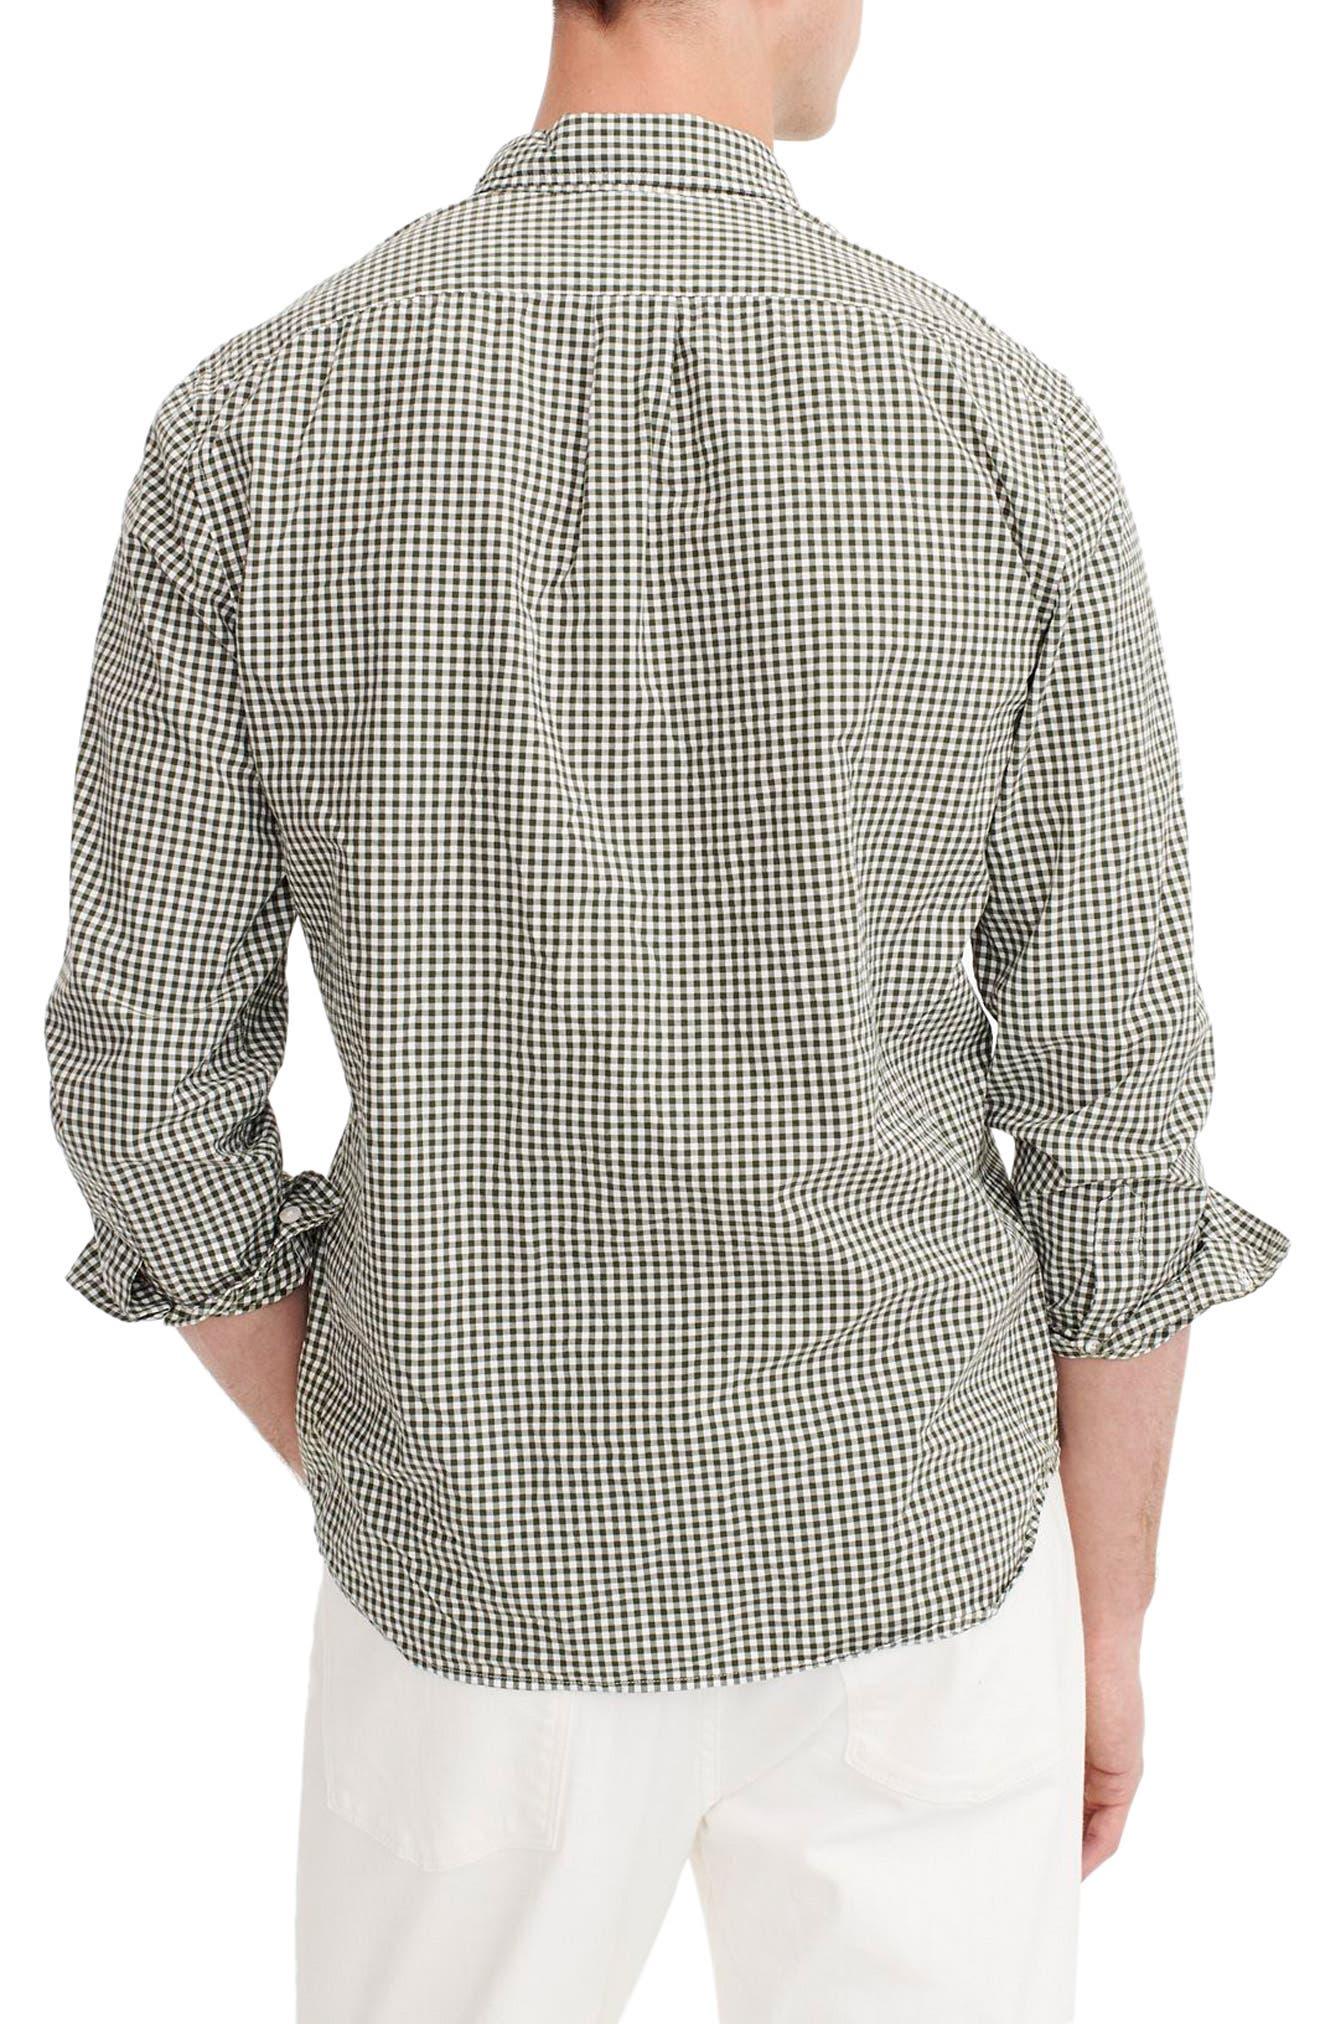 J.CREW Slim Fit Stretch Secret Wash Gingham Sport Shirt, Main, color, 401